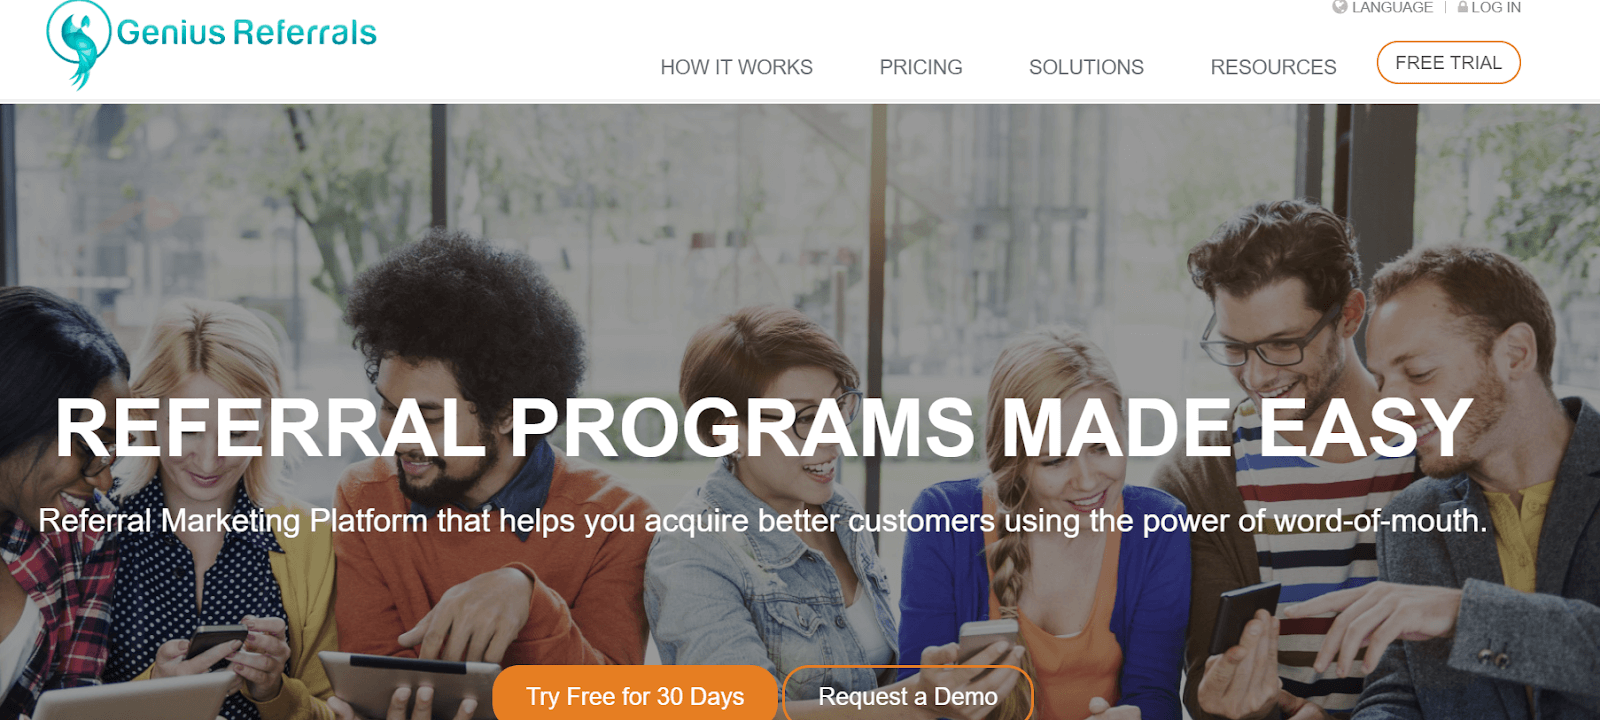 Genius Referrals Referral Marketing Software Tool